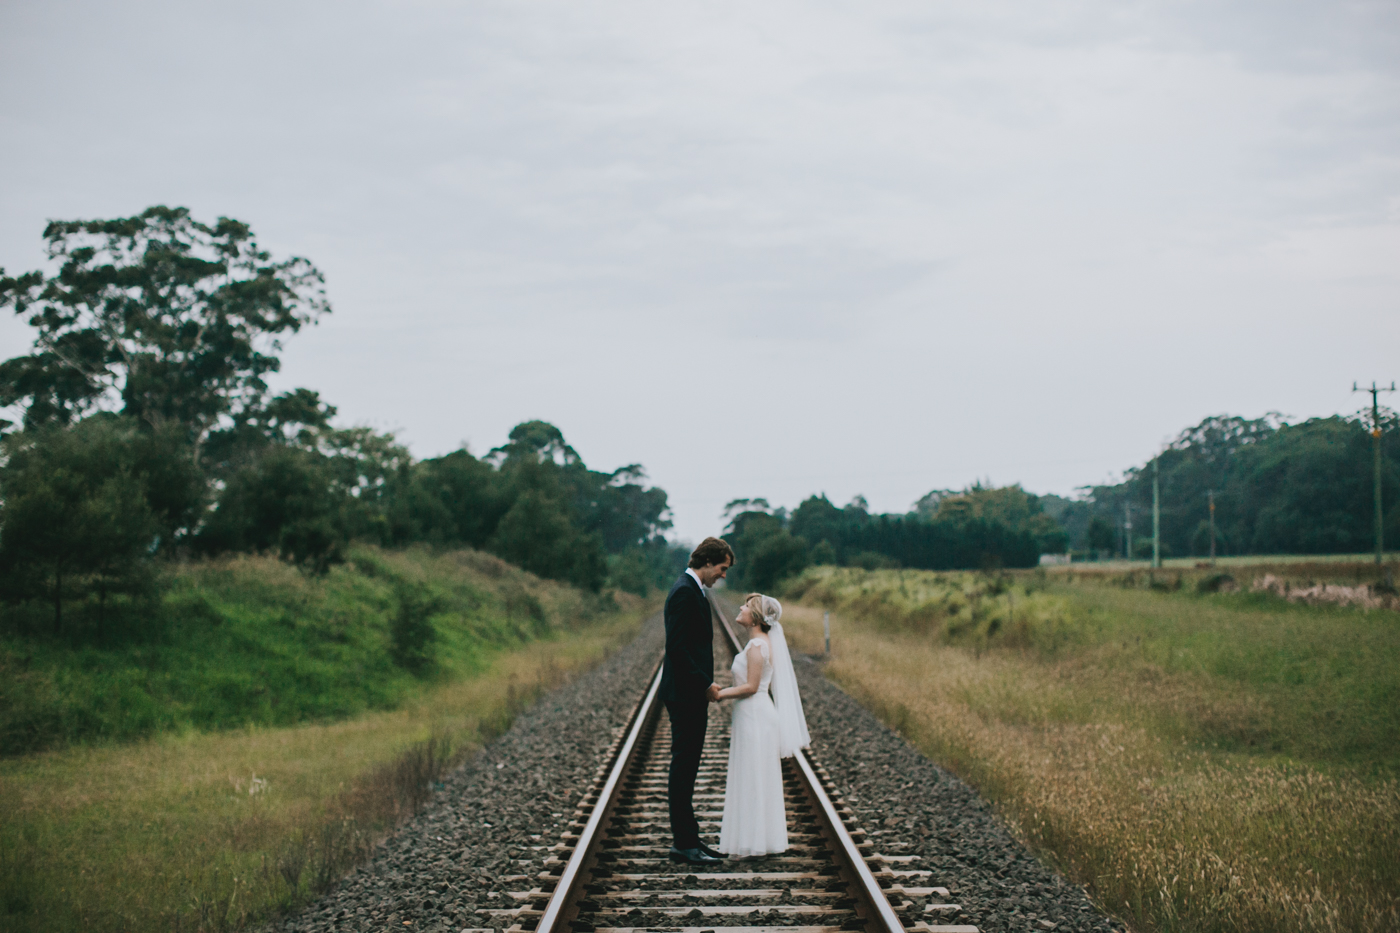 Rachel & Jacob - Willow Farm Berry - South Coast Wedding - Samantha Heather Photography-165.jpg